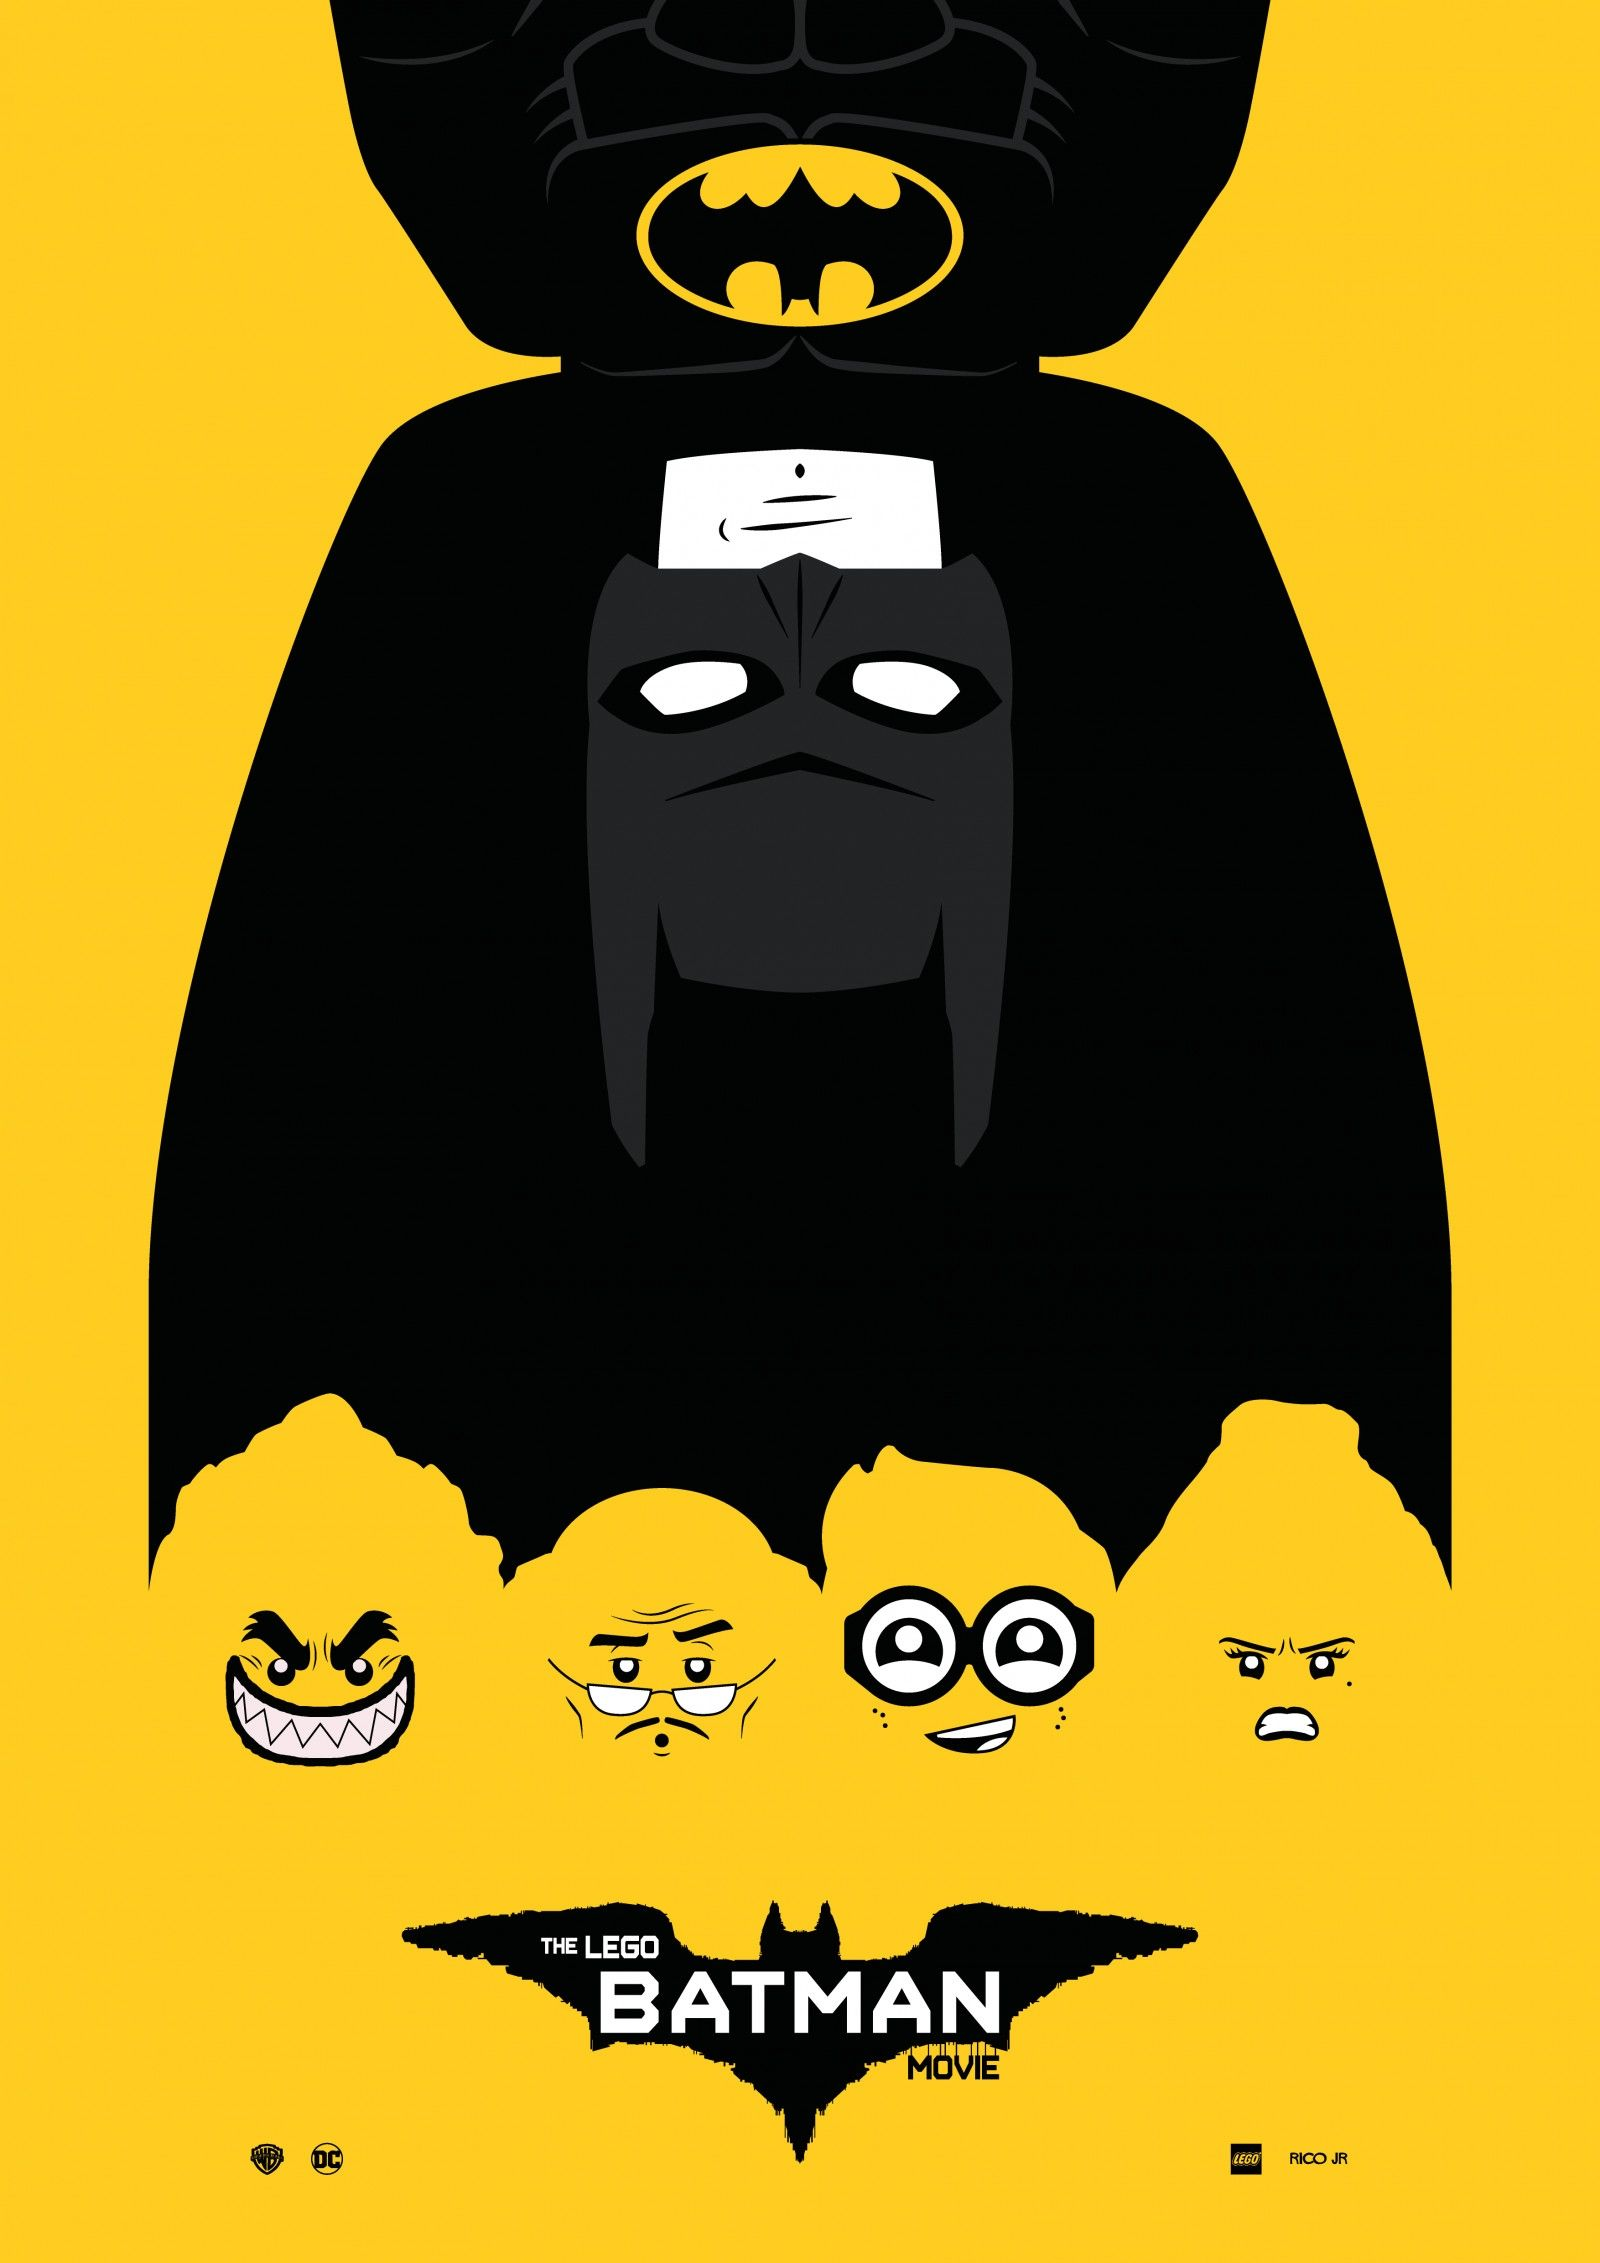 Batman Cartoon Wallpaper 76 Images Within Batman Cartoon Iphone